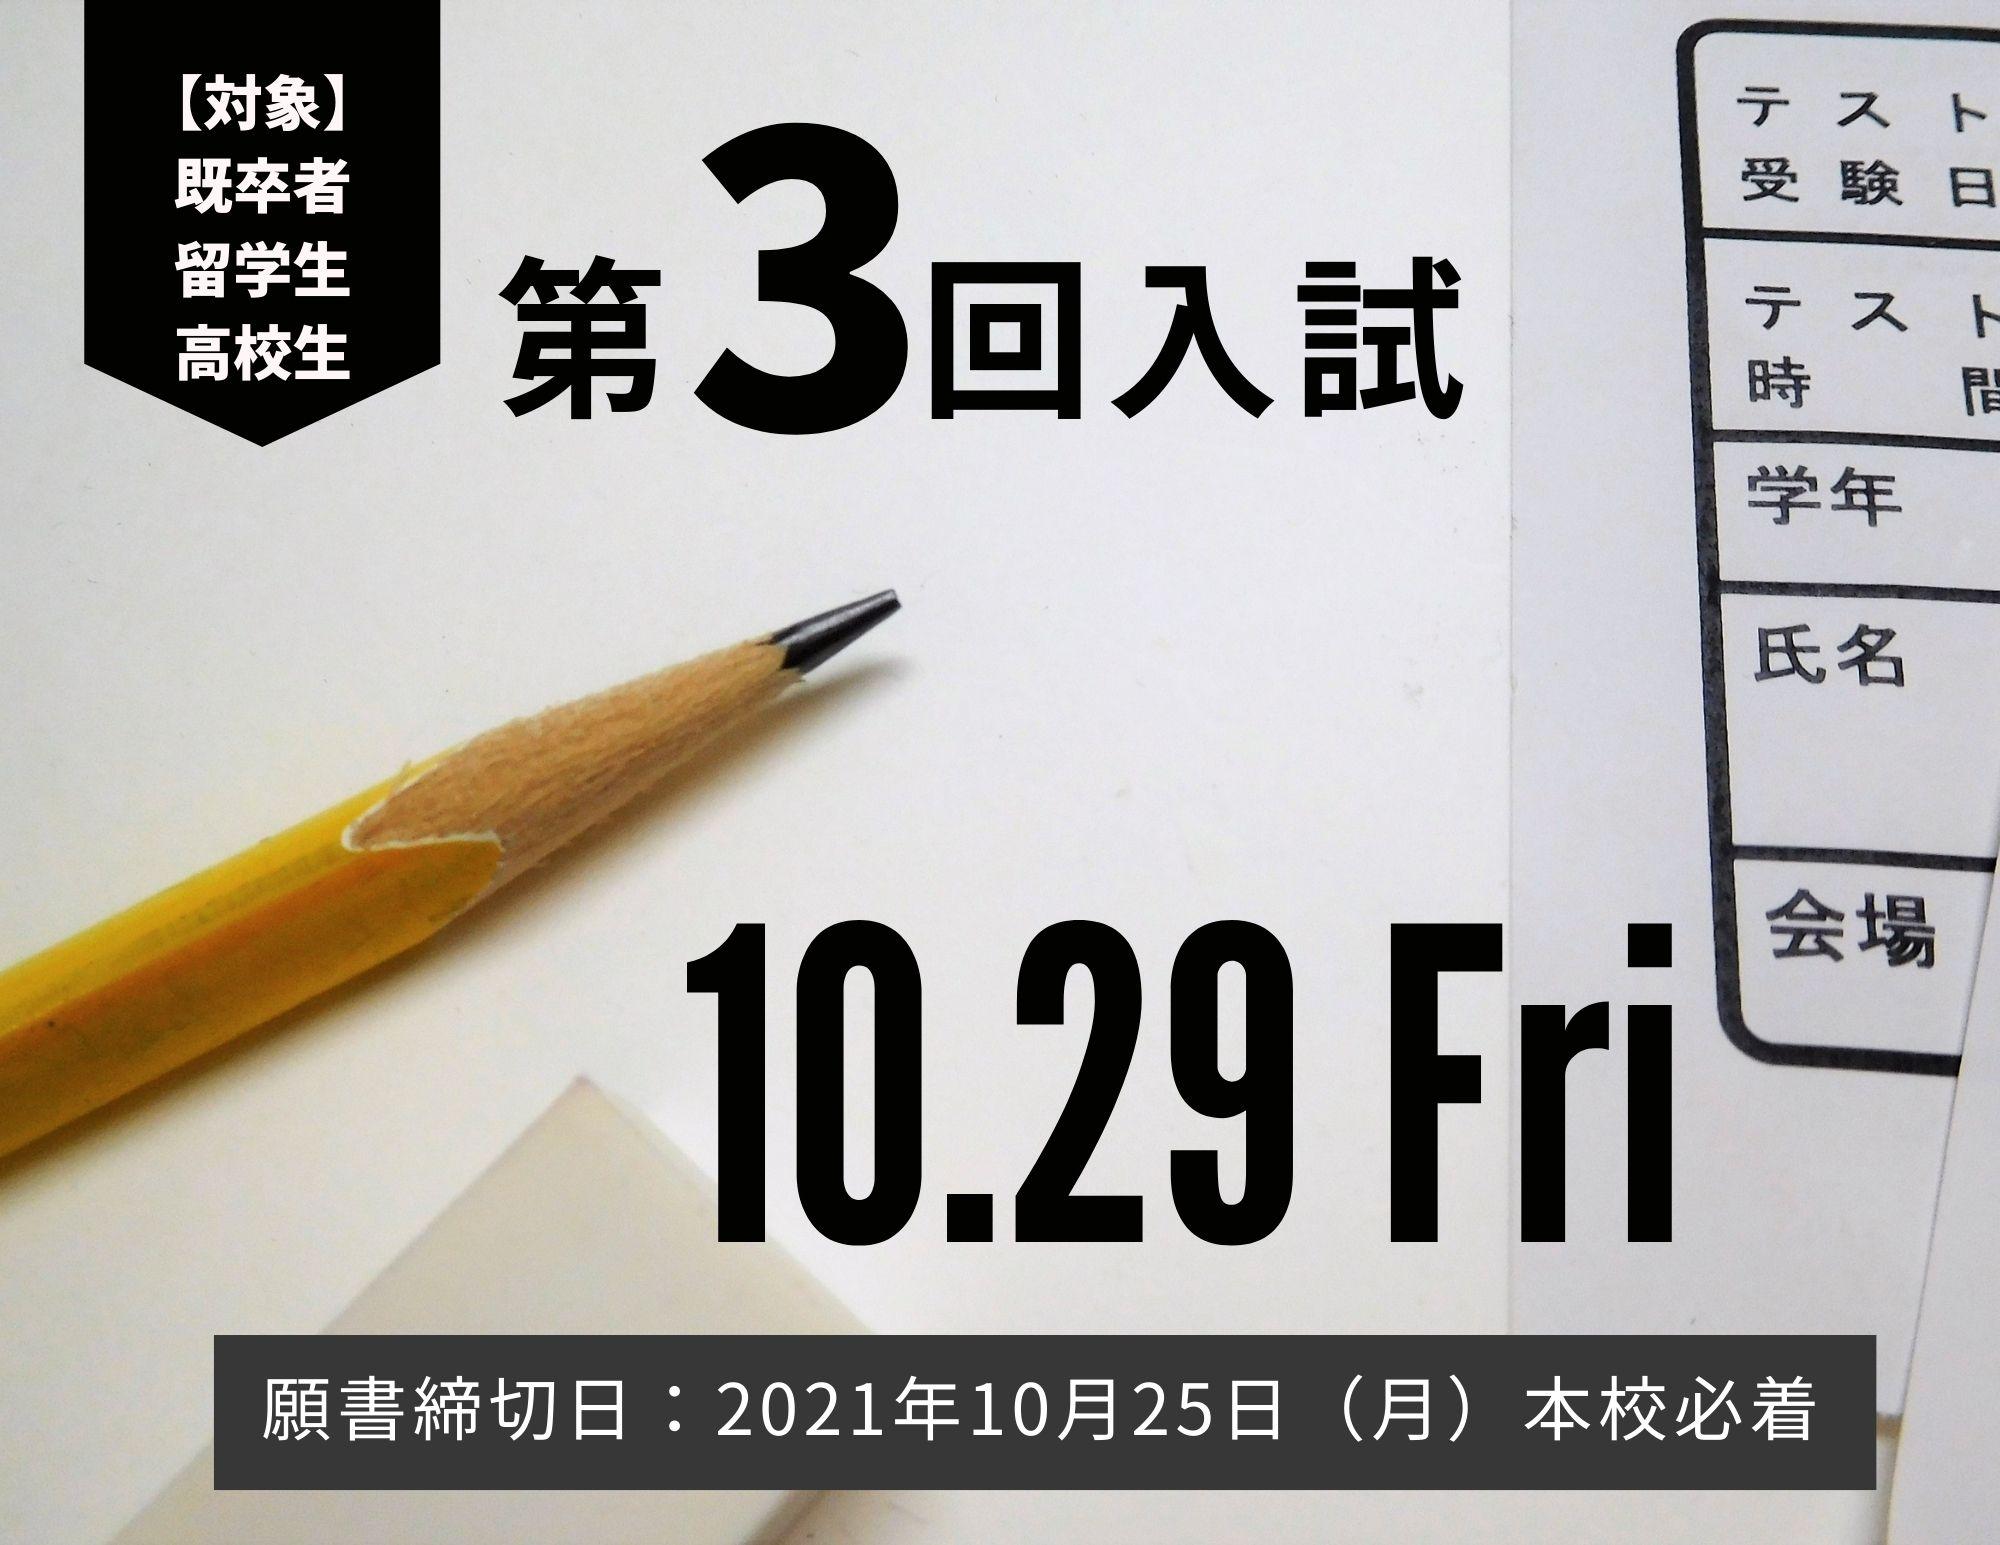 【START】第3回入試のご案内(10月29日金曜日)